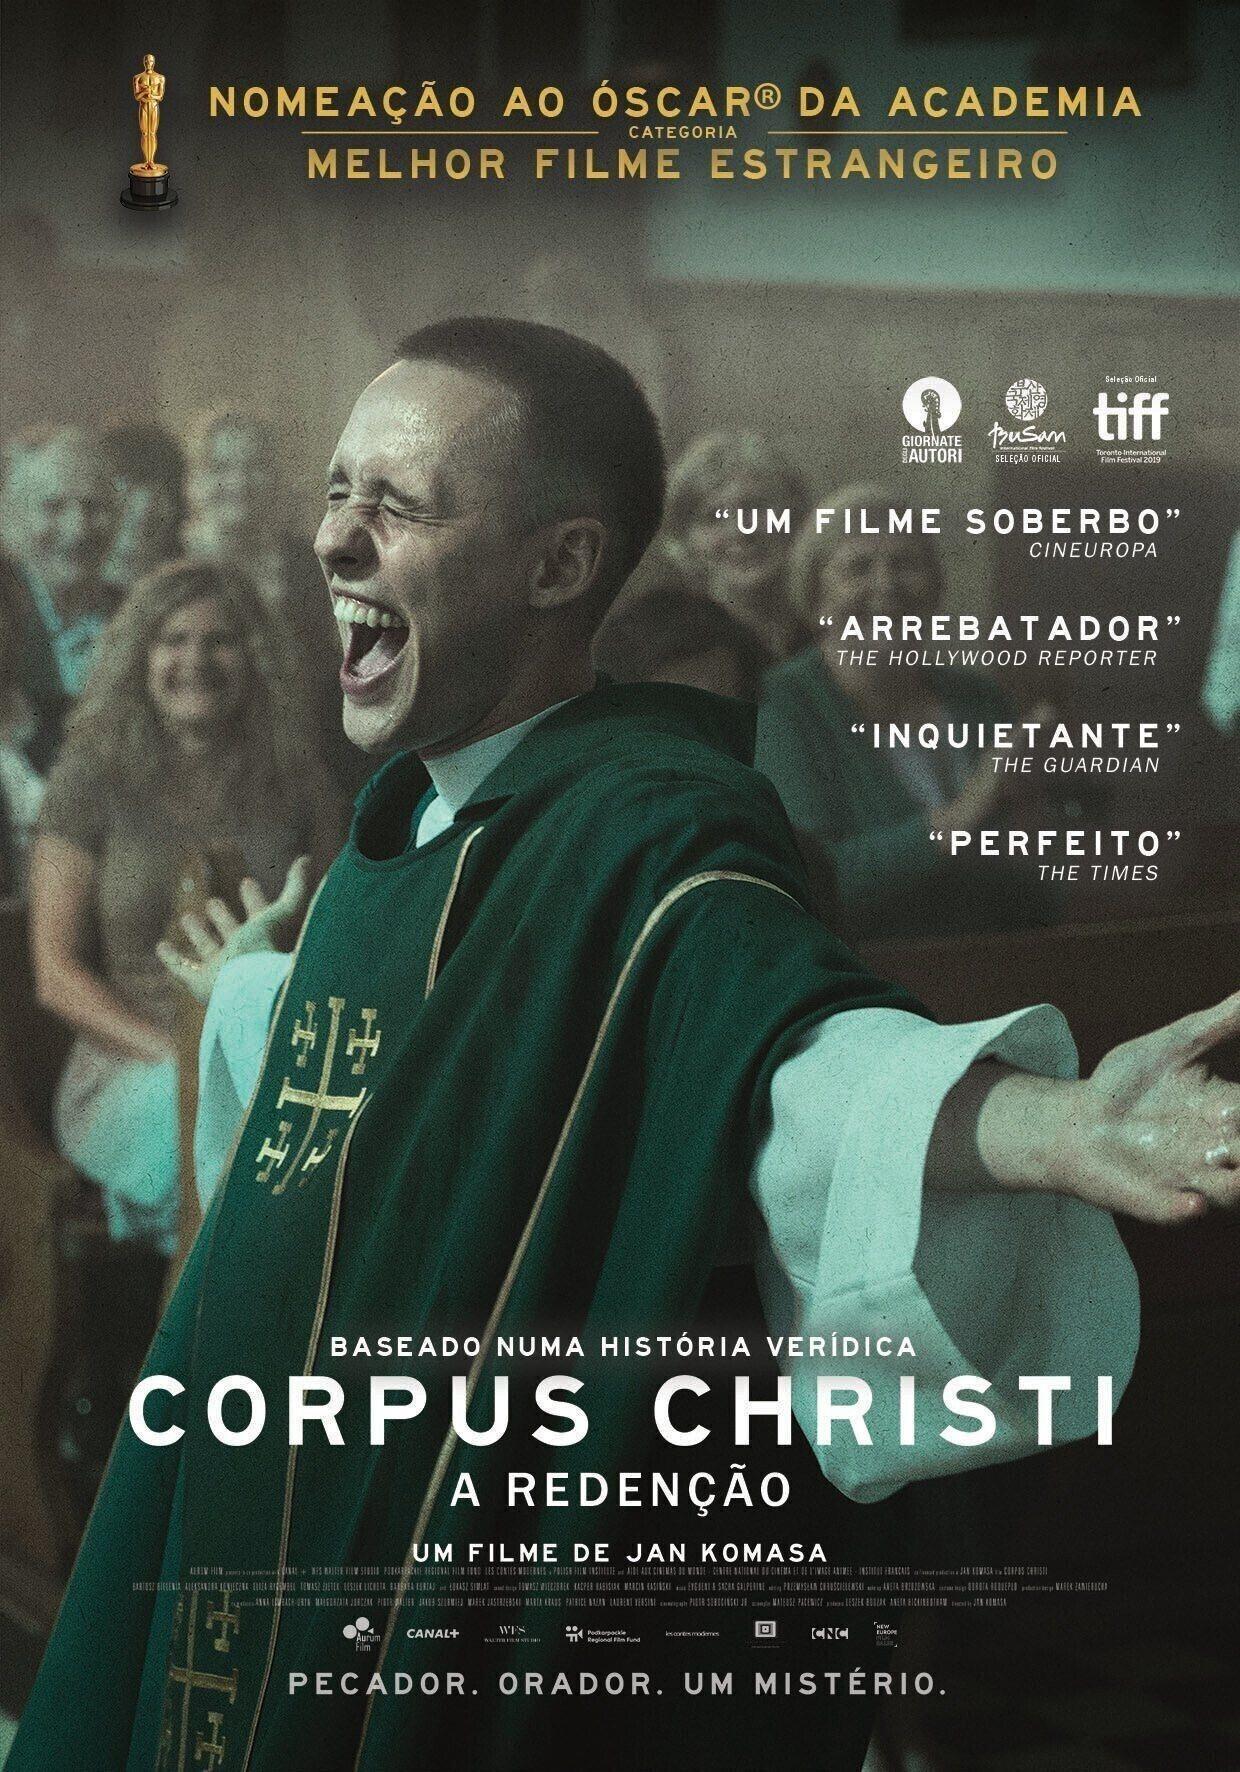 poster CORPUS CHRISTI light y